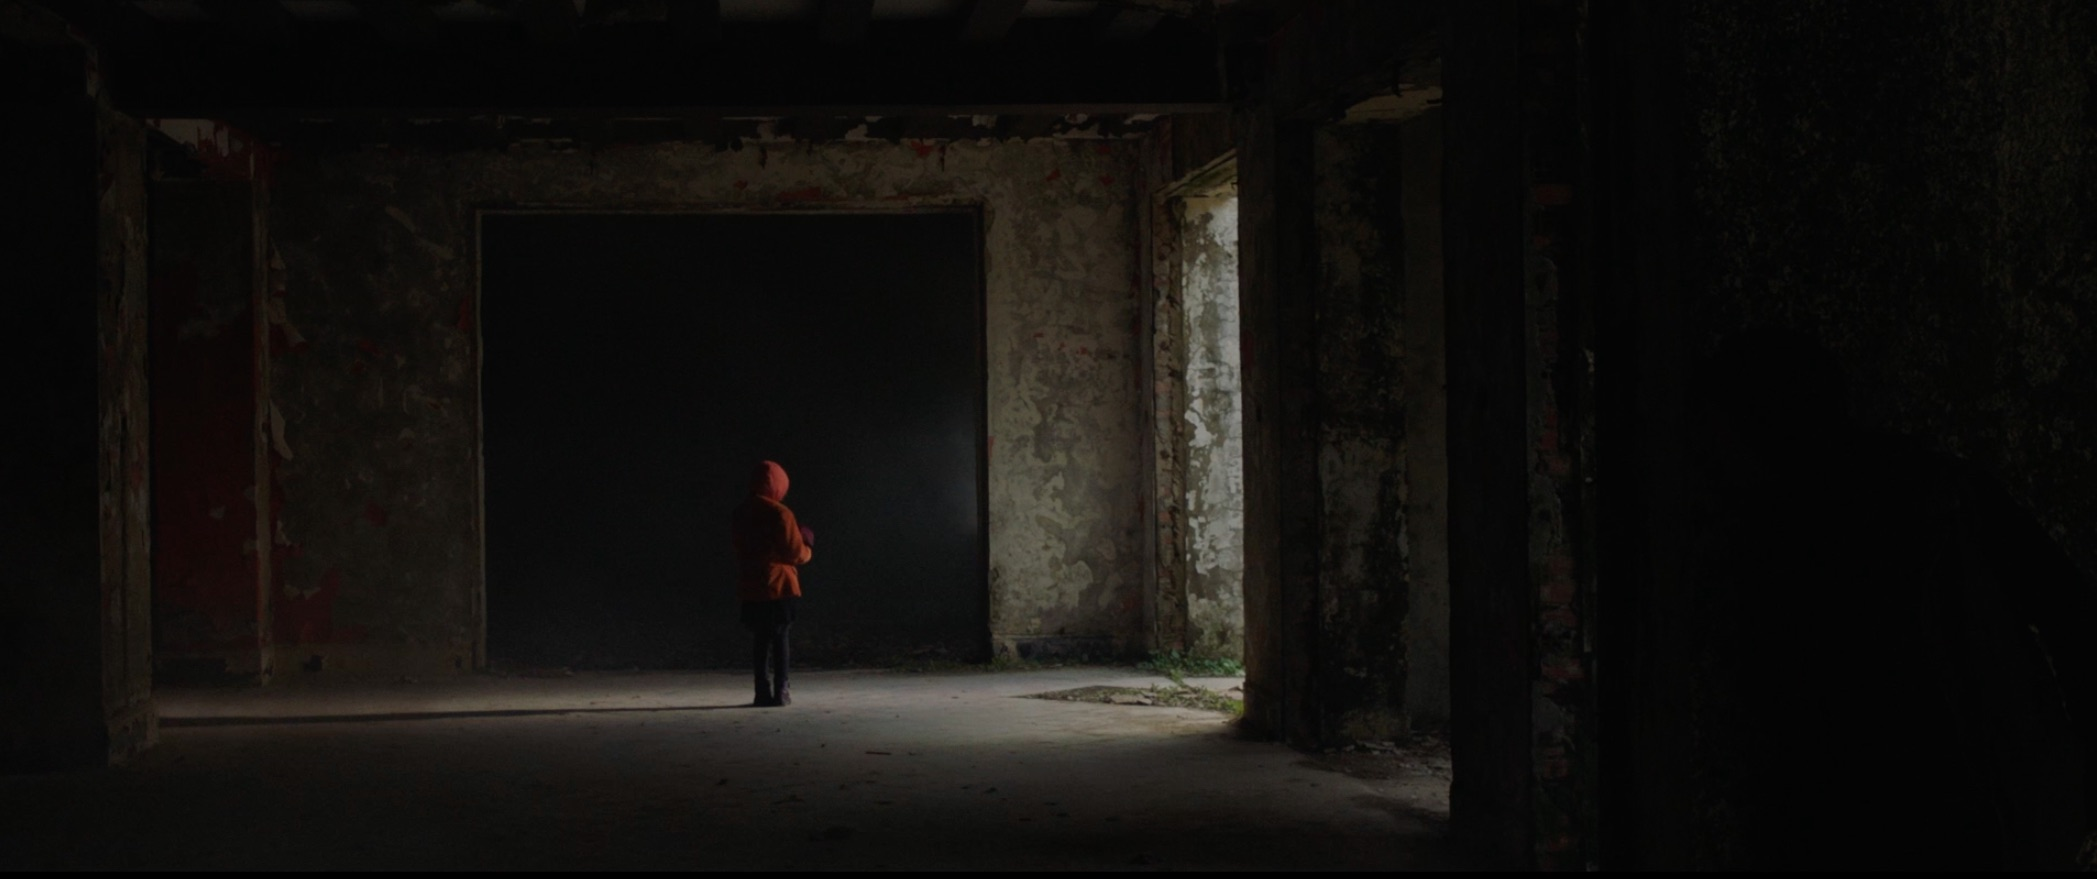 """Dachra"" by Abdelhamid Bouchnak - ""Since the 2011 revolution, Tunisian cinema is being reborn""."